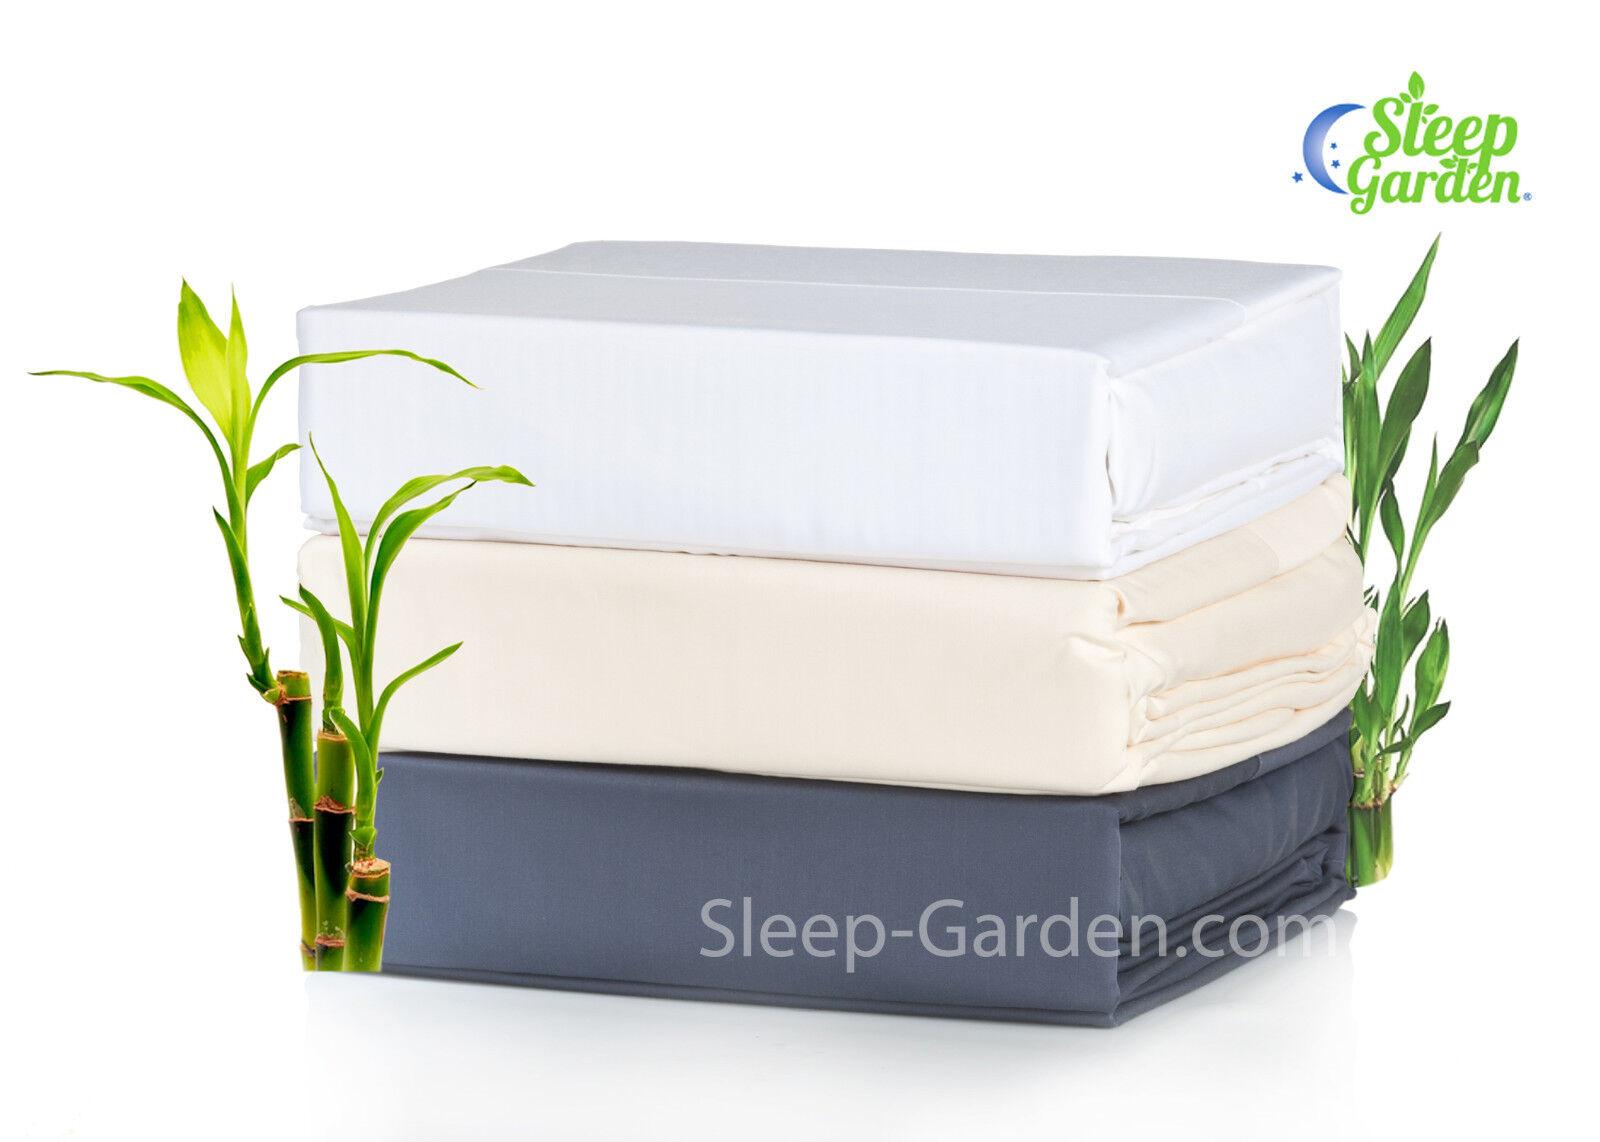 SLEEP GARDEN 100% Bamboo Sheets, 320tc, 3-4 Piece Sheet Set, All Sizes  3 colors